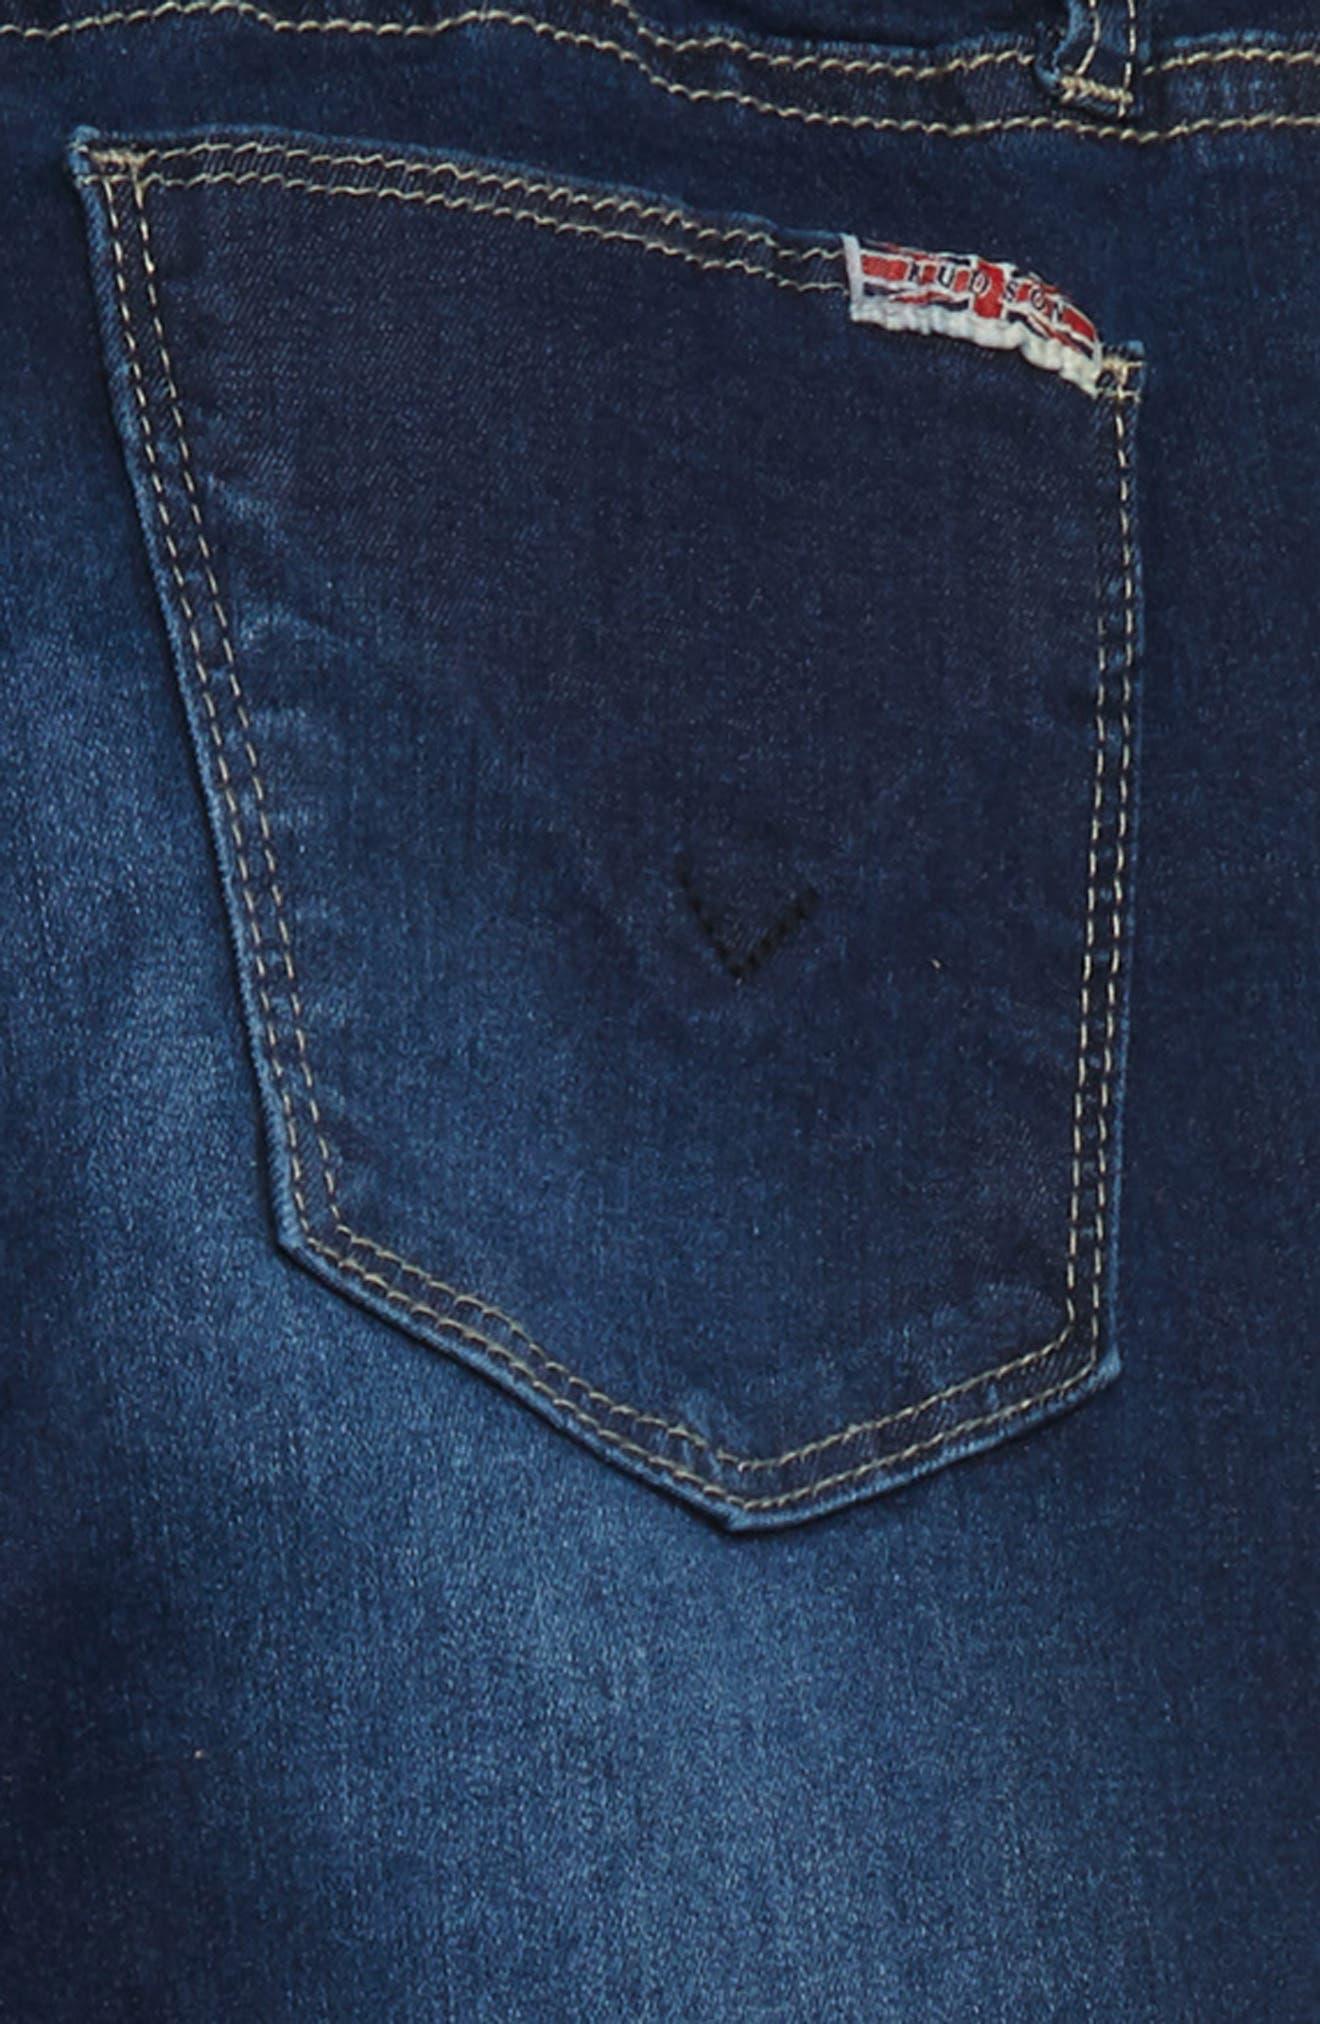 Christa Release Hem Skinny Jeans,                             Alternate thumbnail 3, color,                             GLEAM WASH